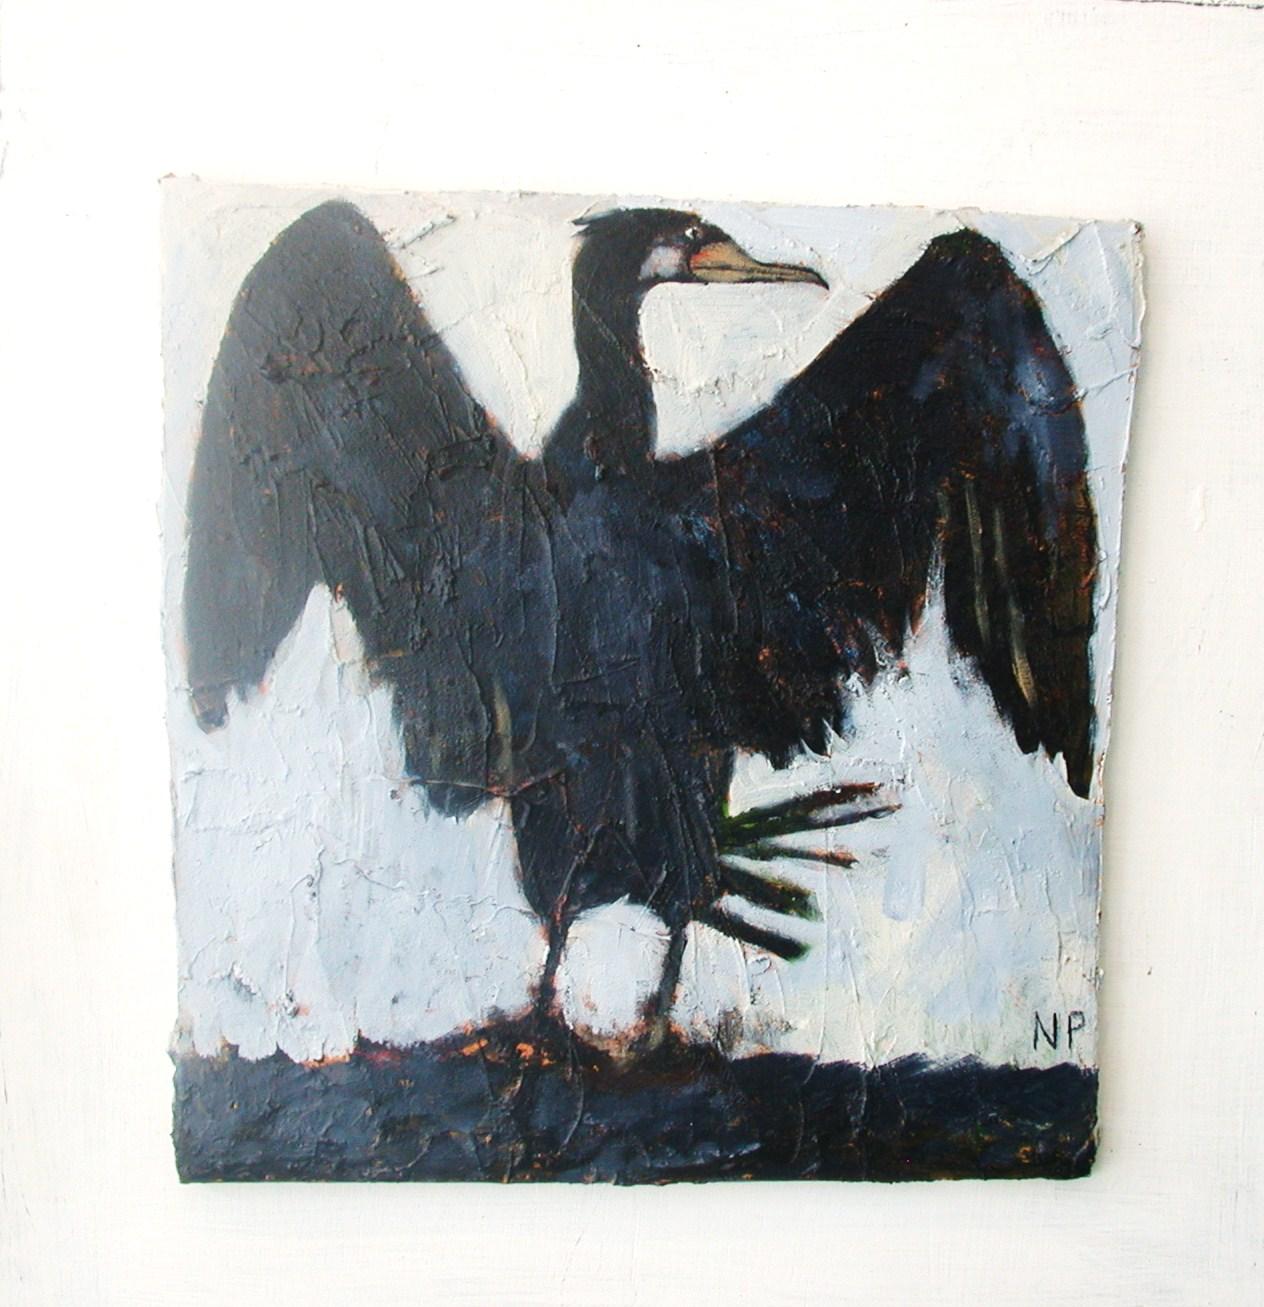 ORIGINAL ART - JANE ADAMS CERAMICS